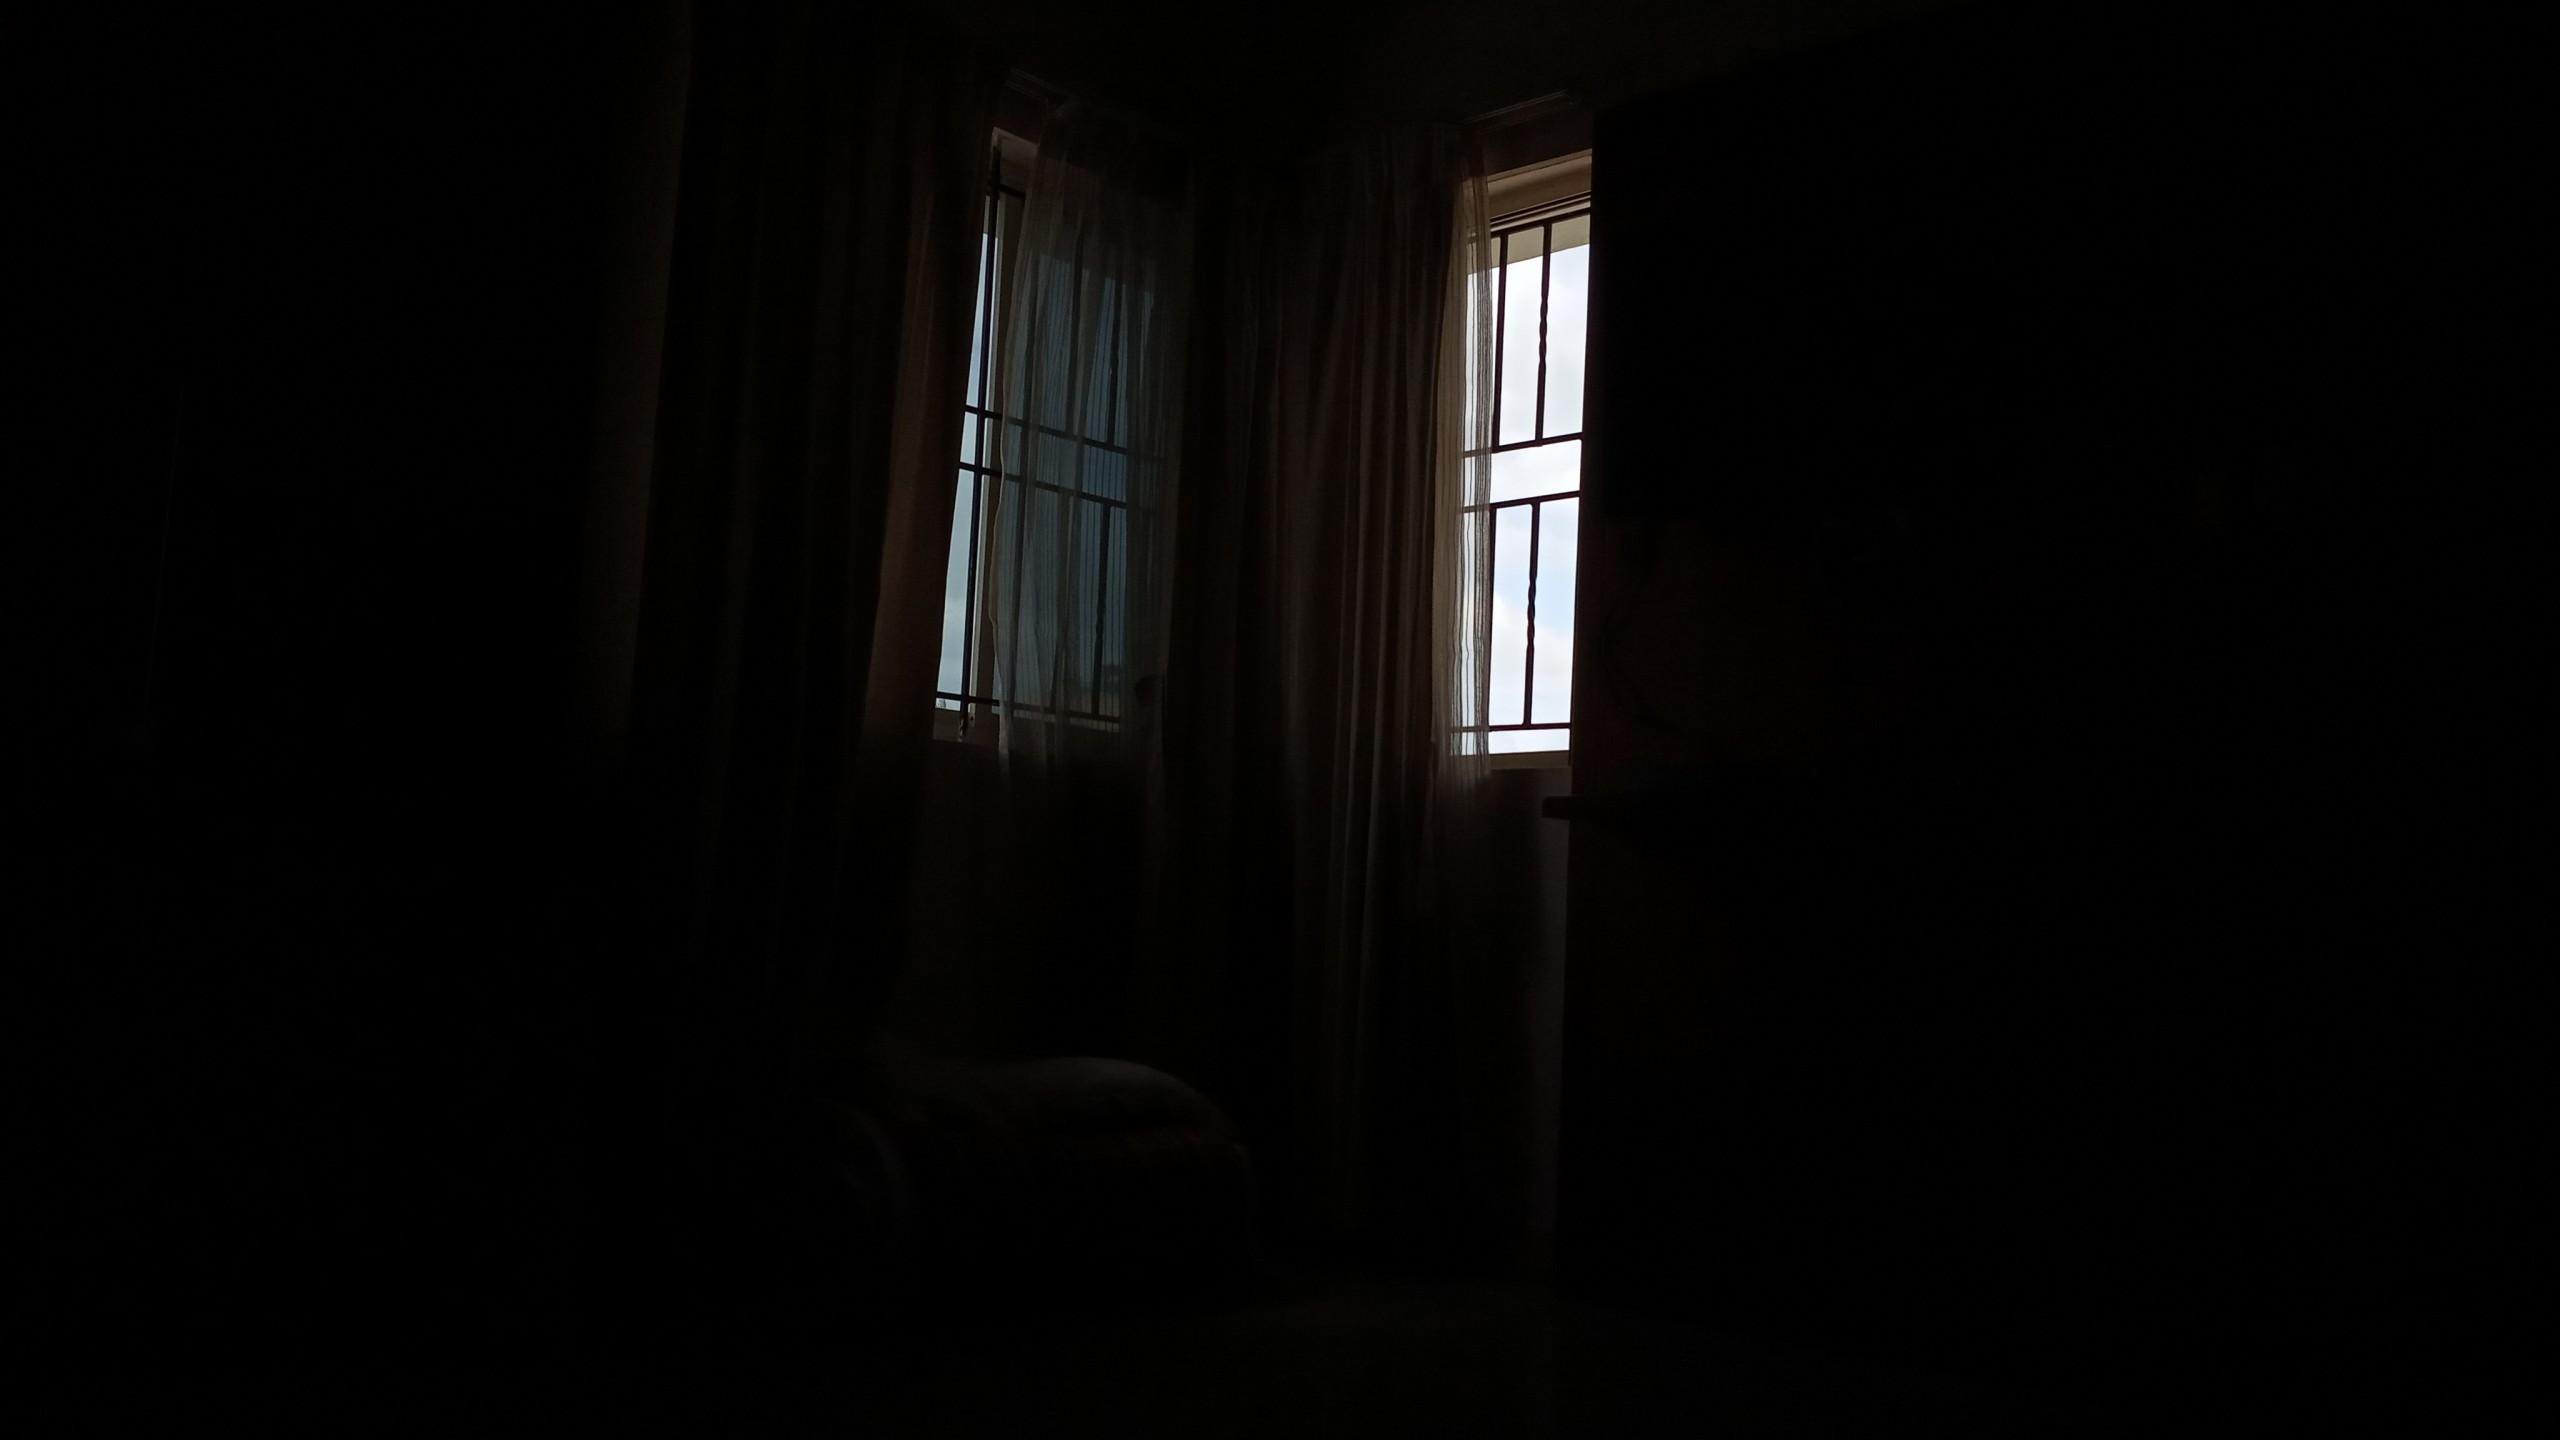 Dark room window